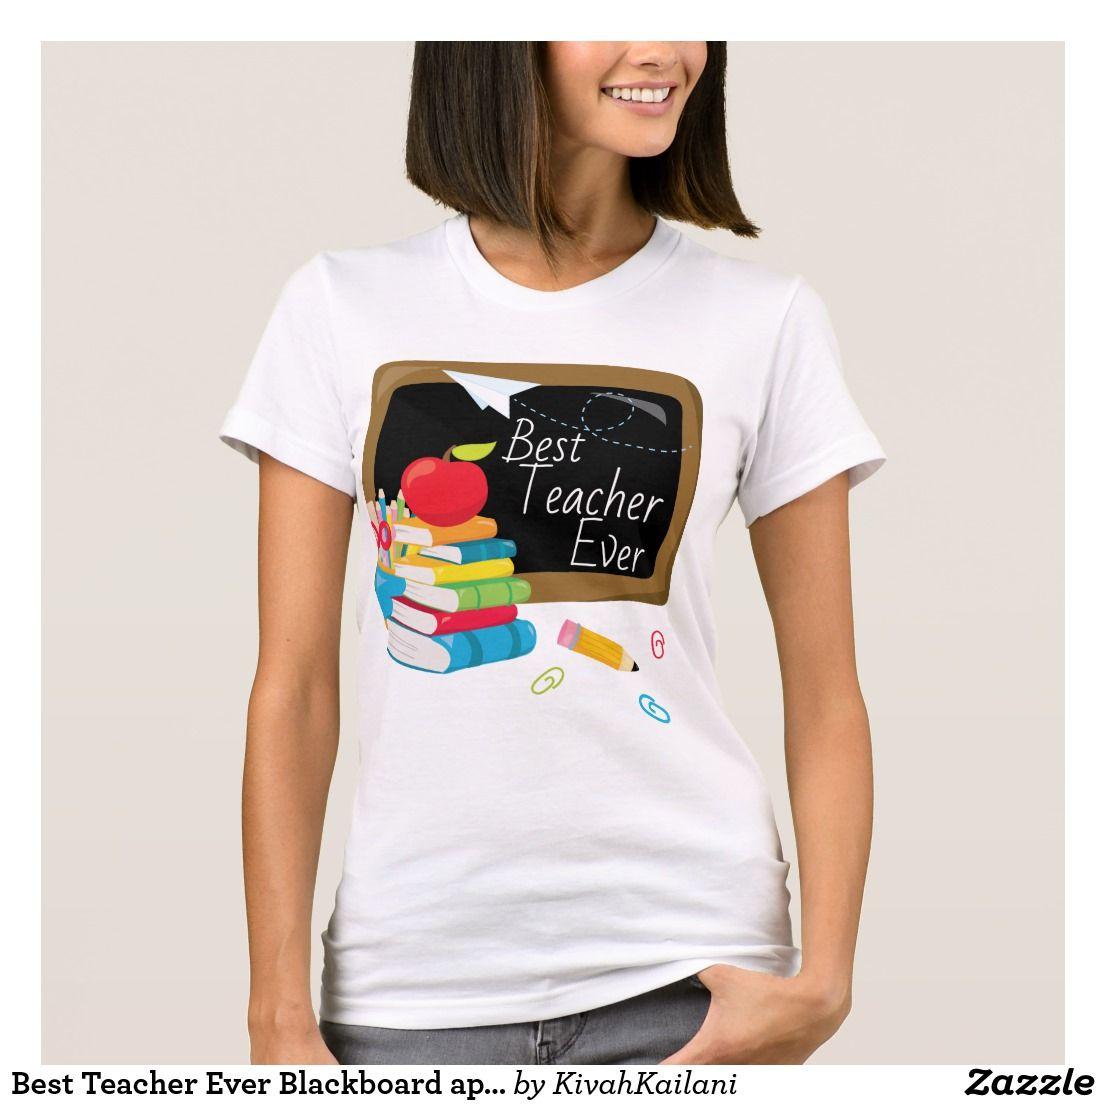 Best Teacher Ever Blackboard apple textbooks T-Shirt ...